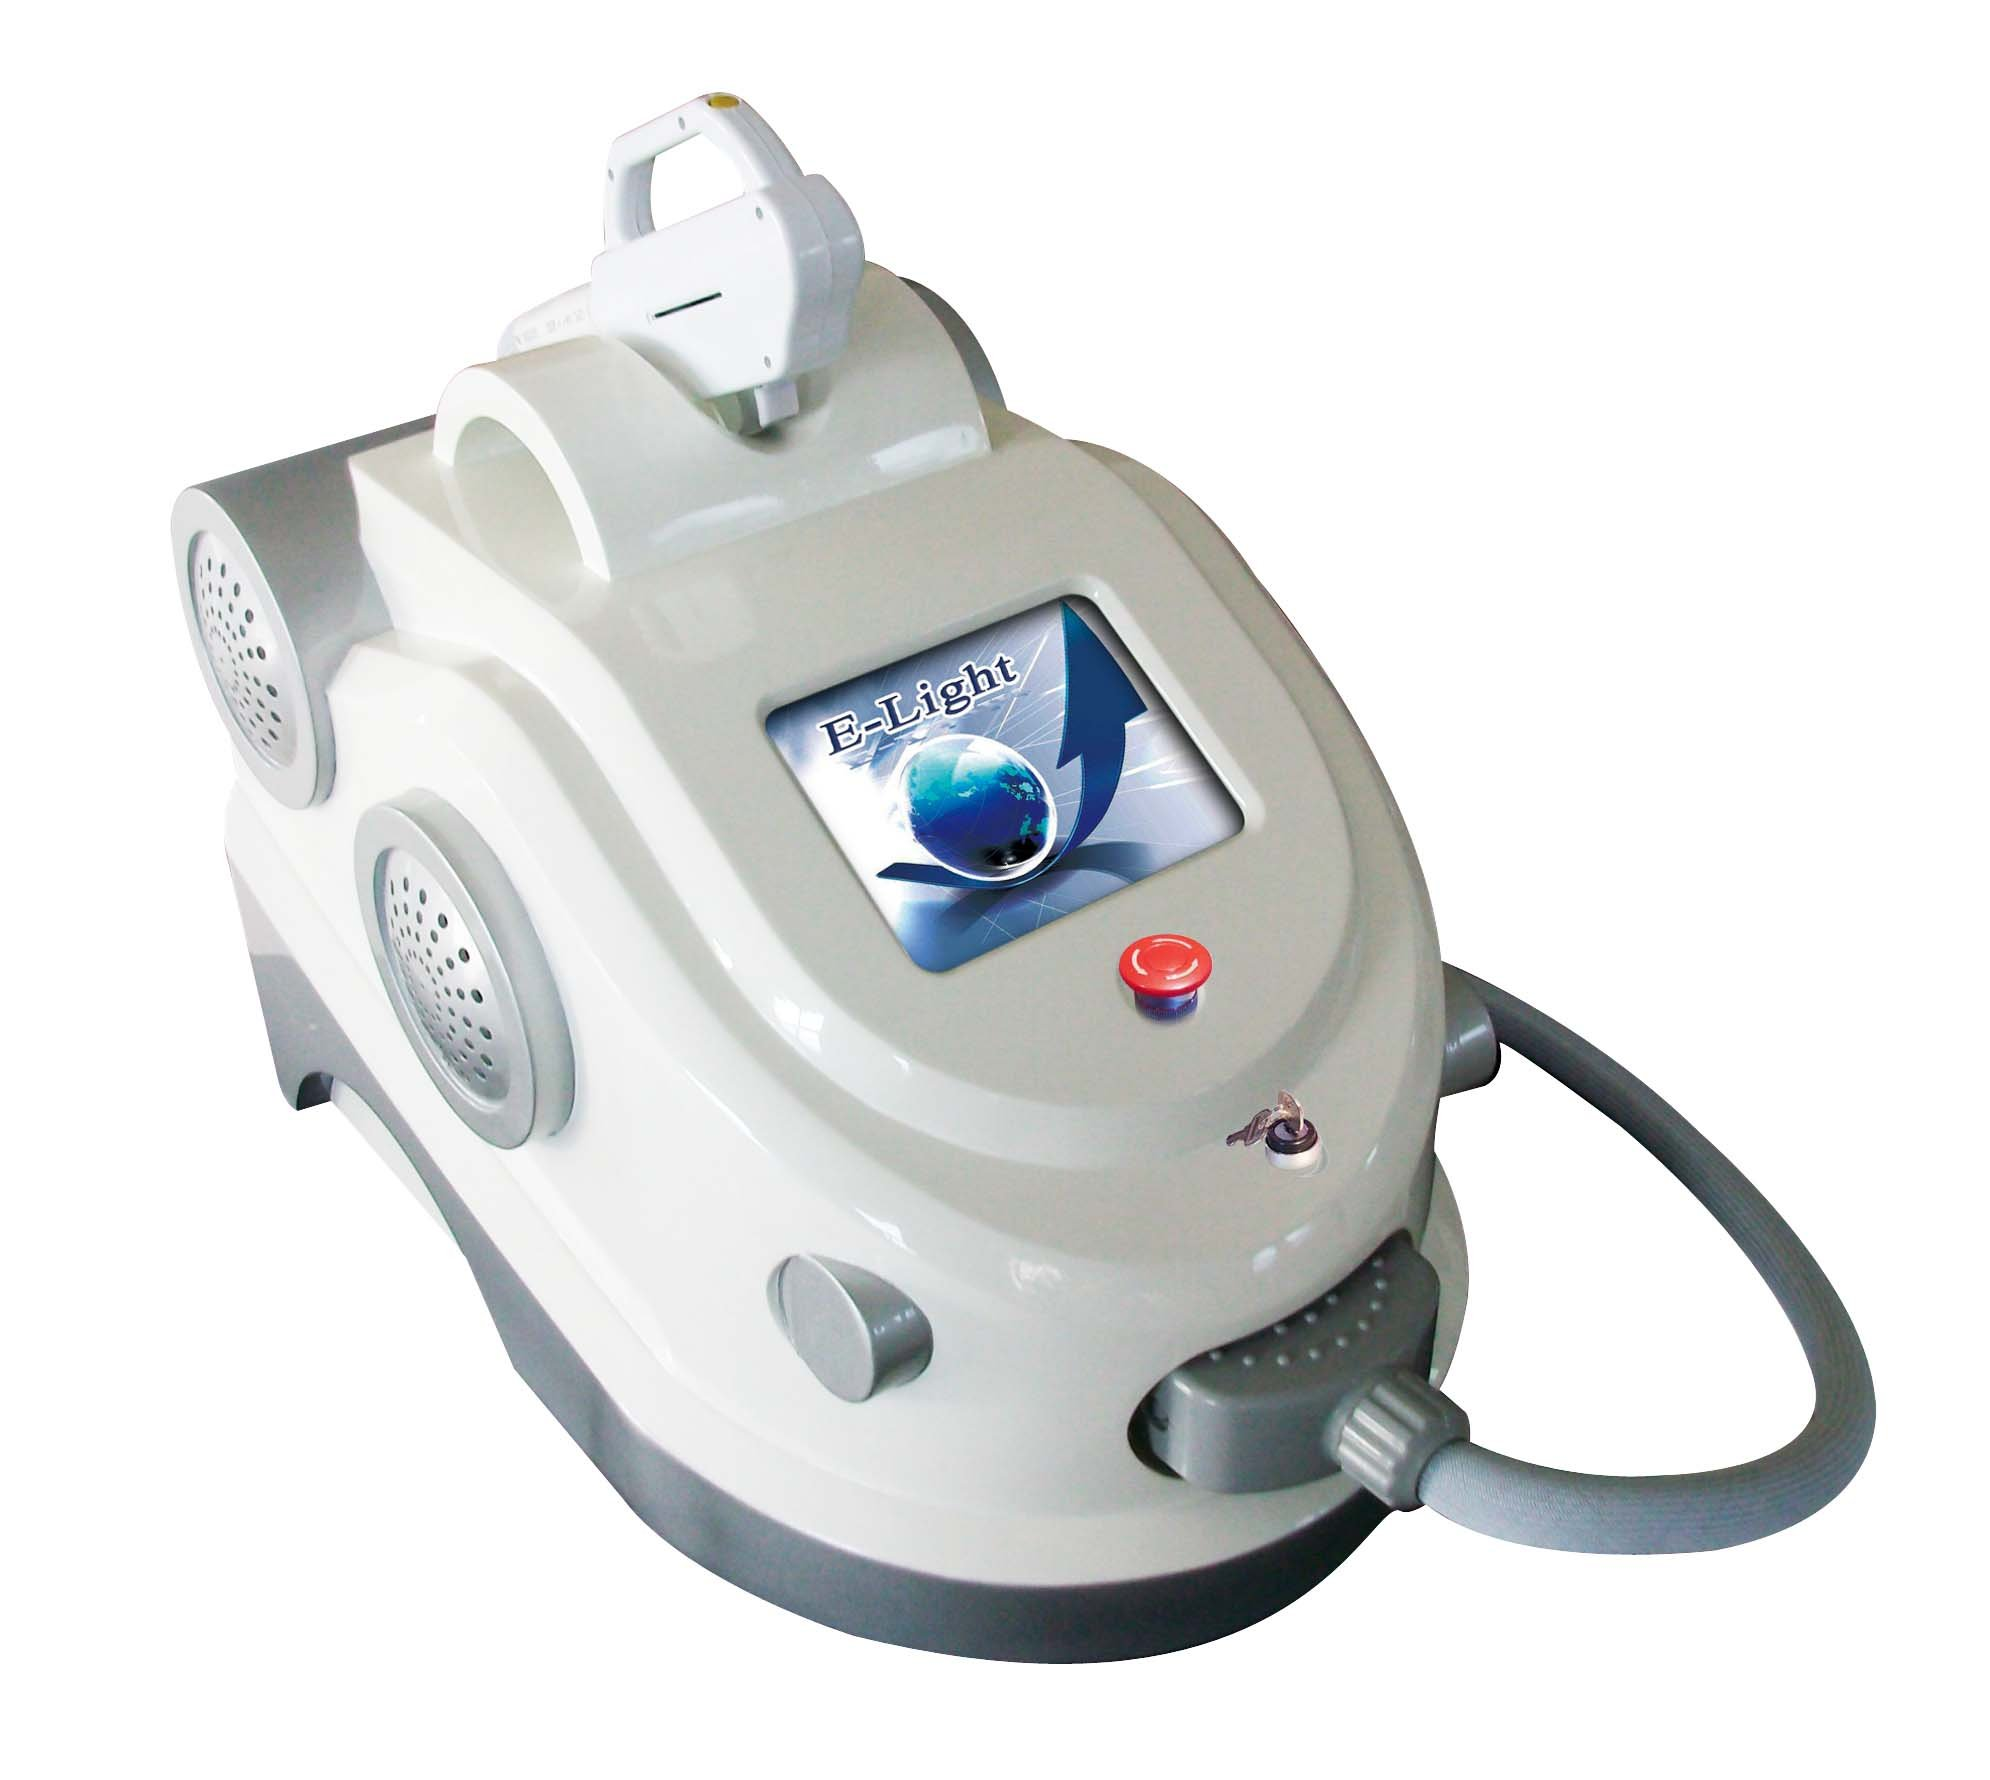 basta portabel ipl laser